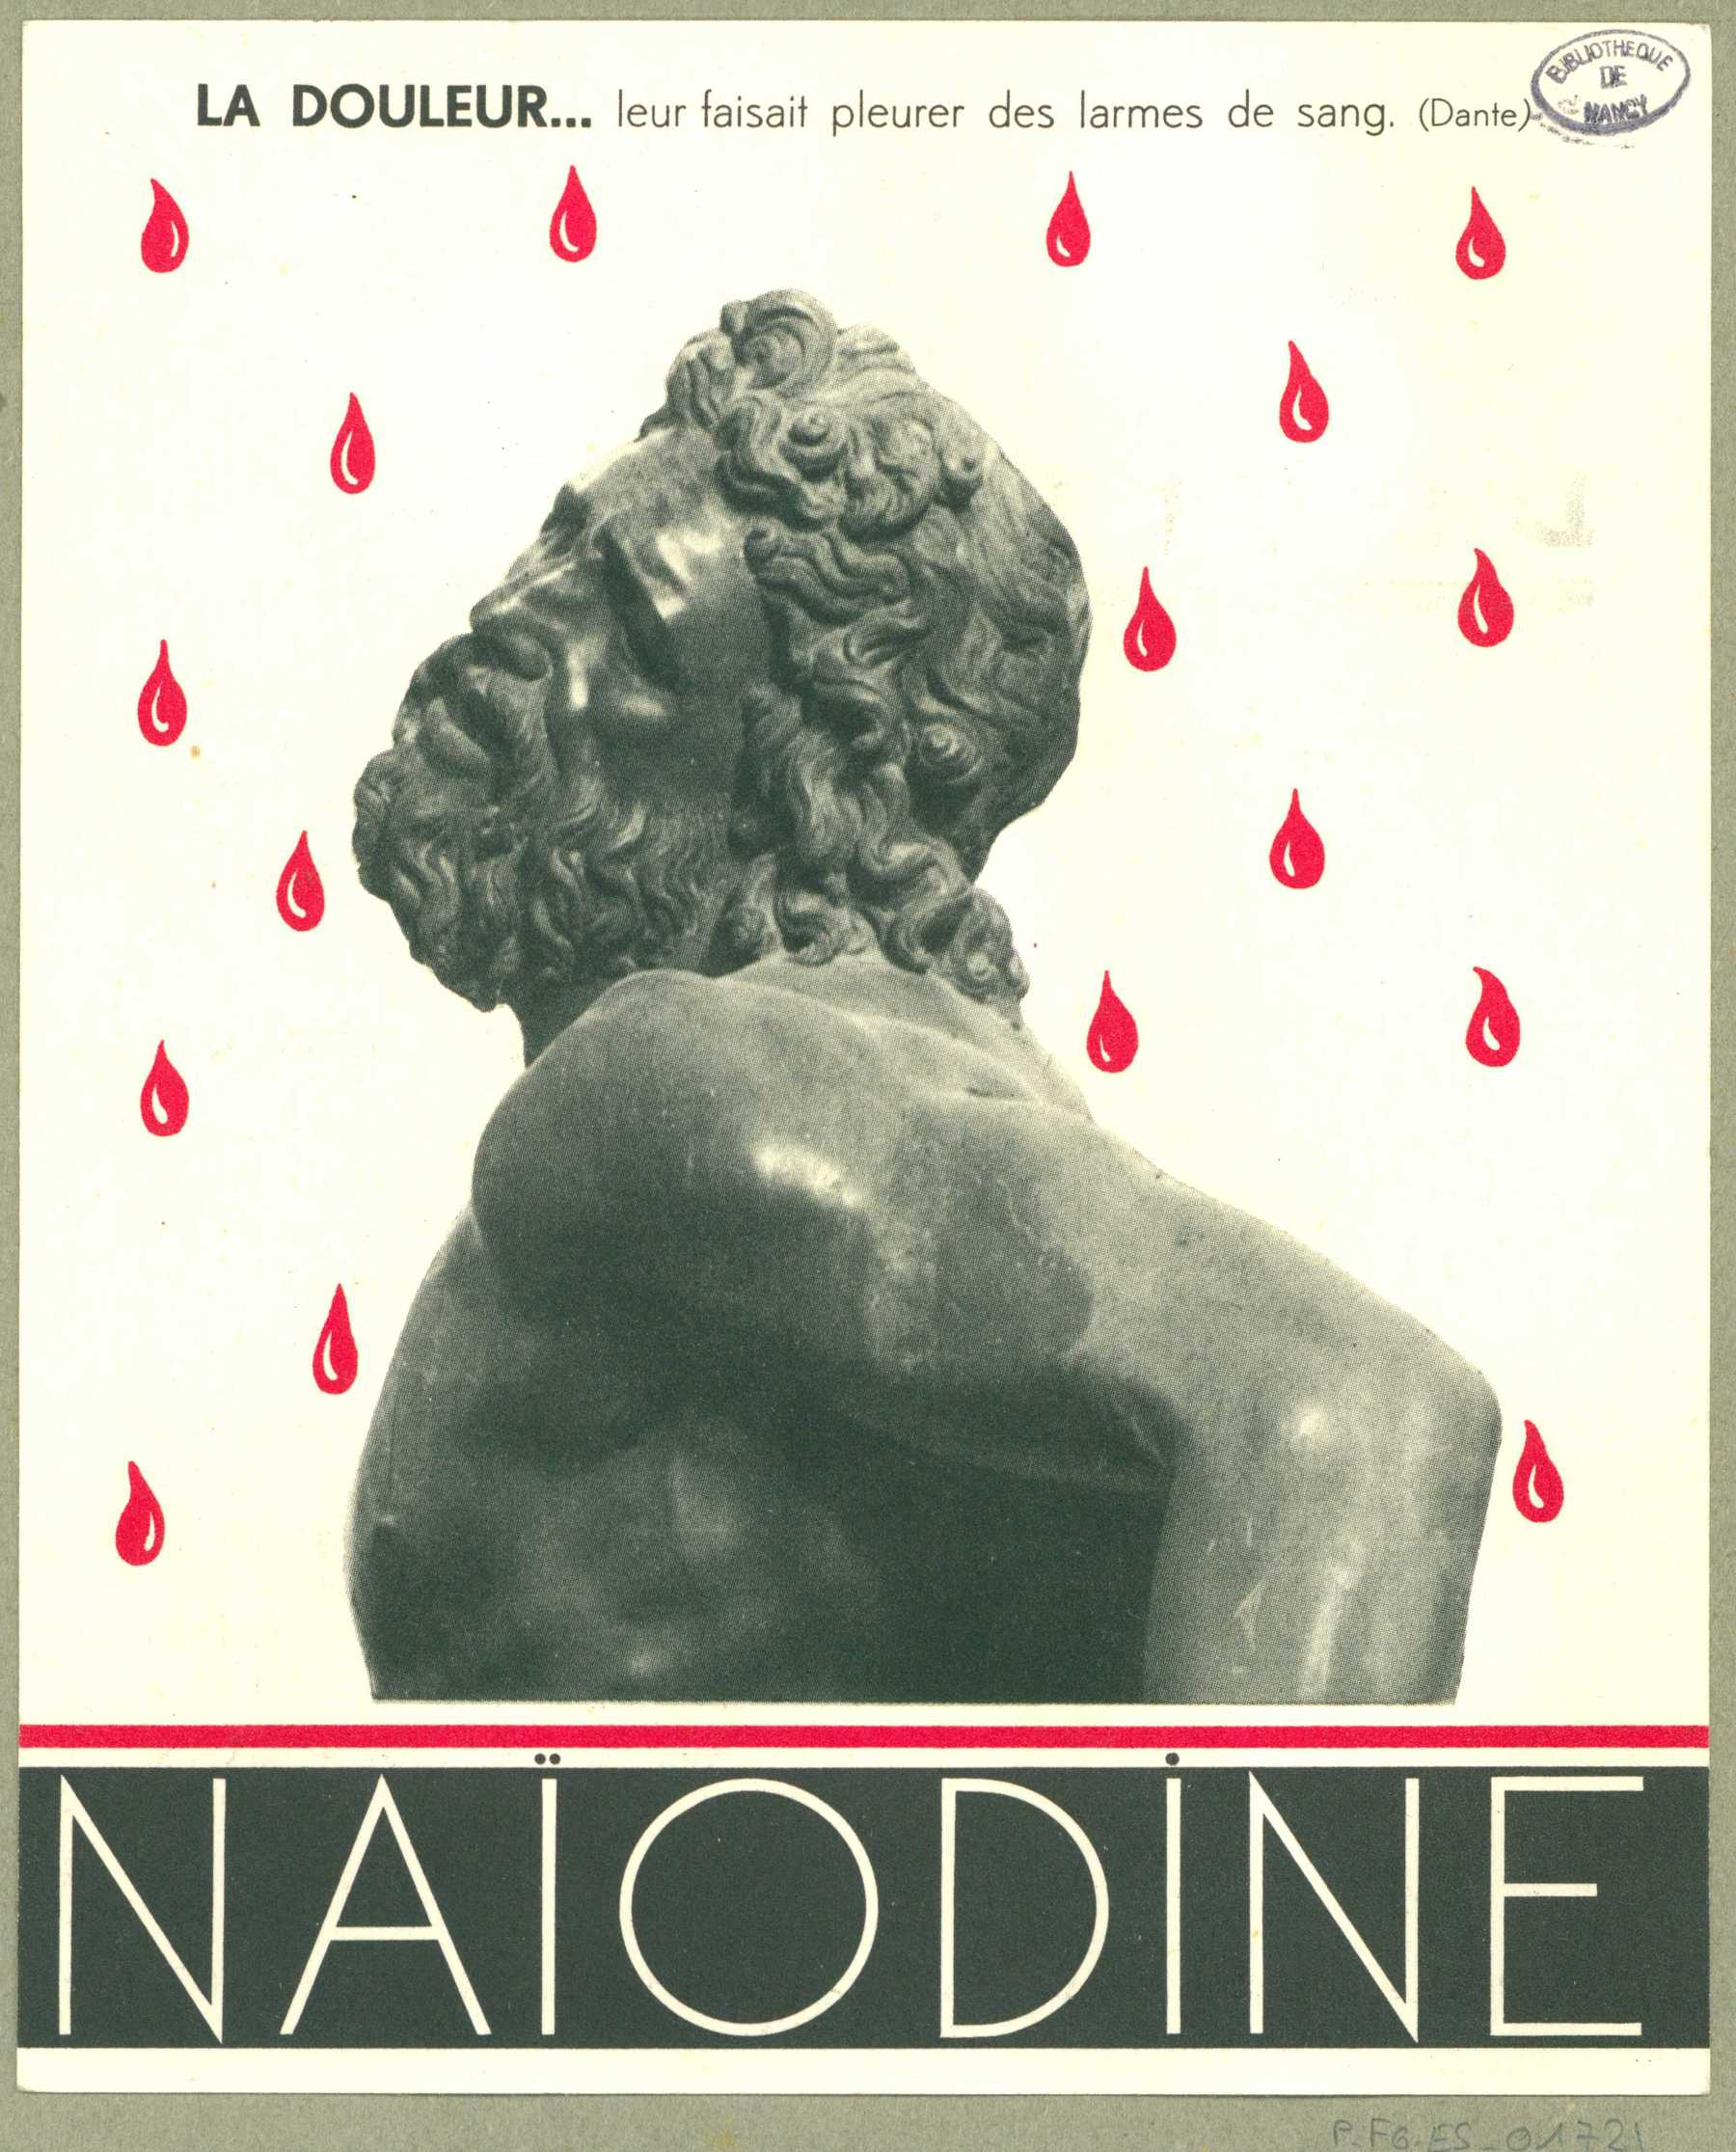 Contenu du Naïodine